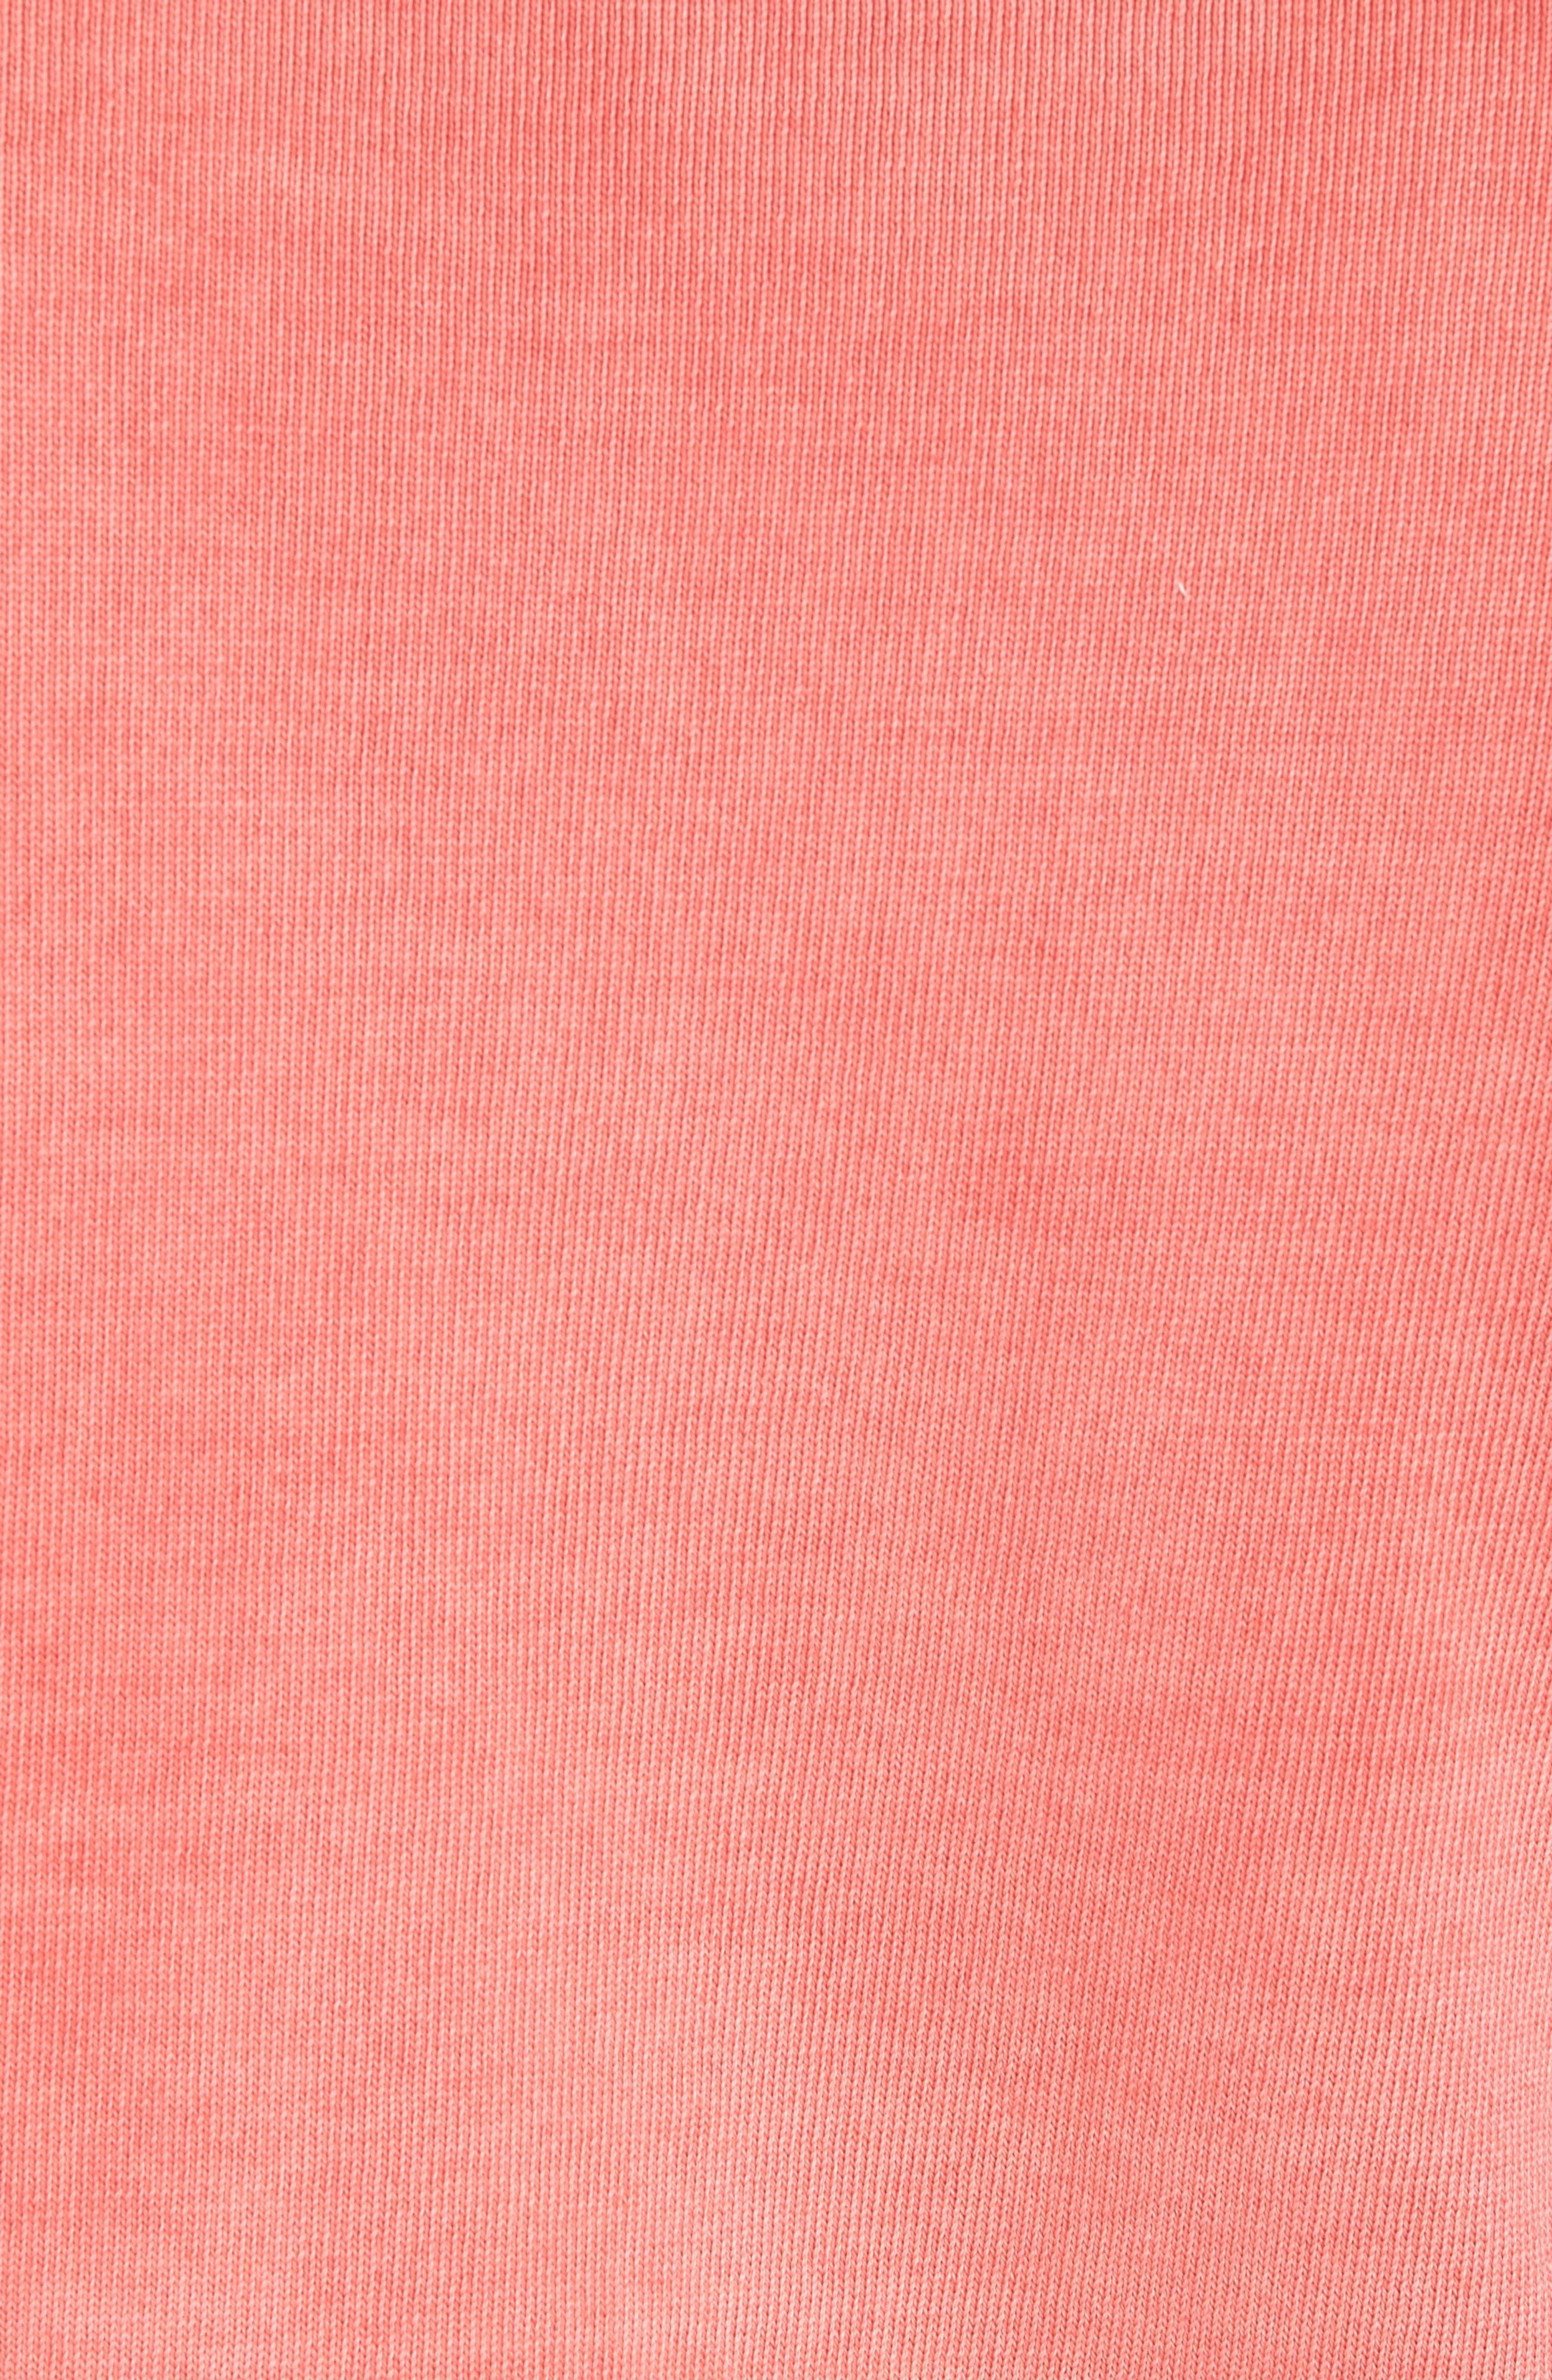 Stonewash Cotton Sweatshirt,                             Alternate thumbnail 5, color,                             Washed Coral